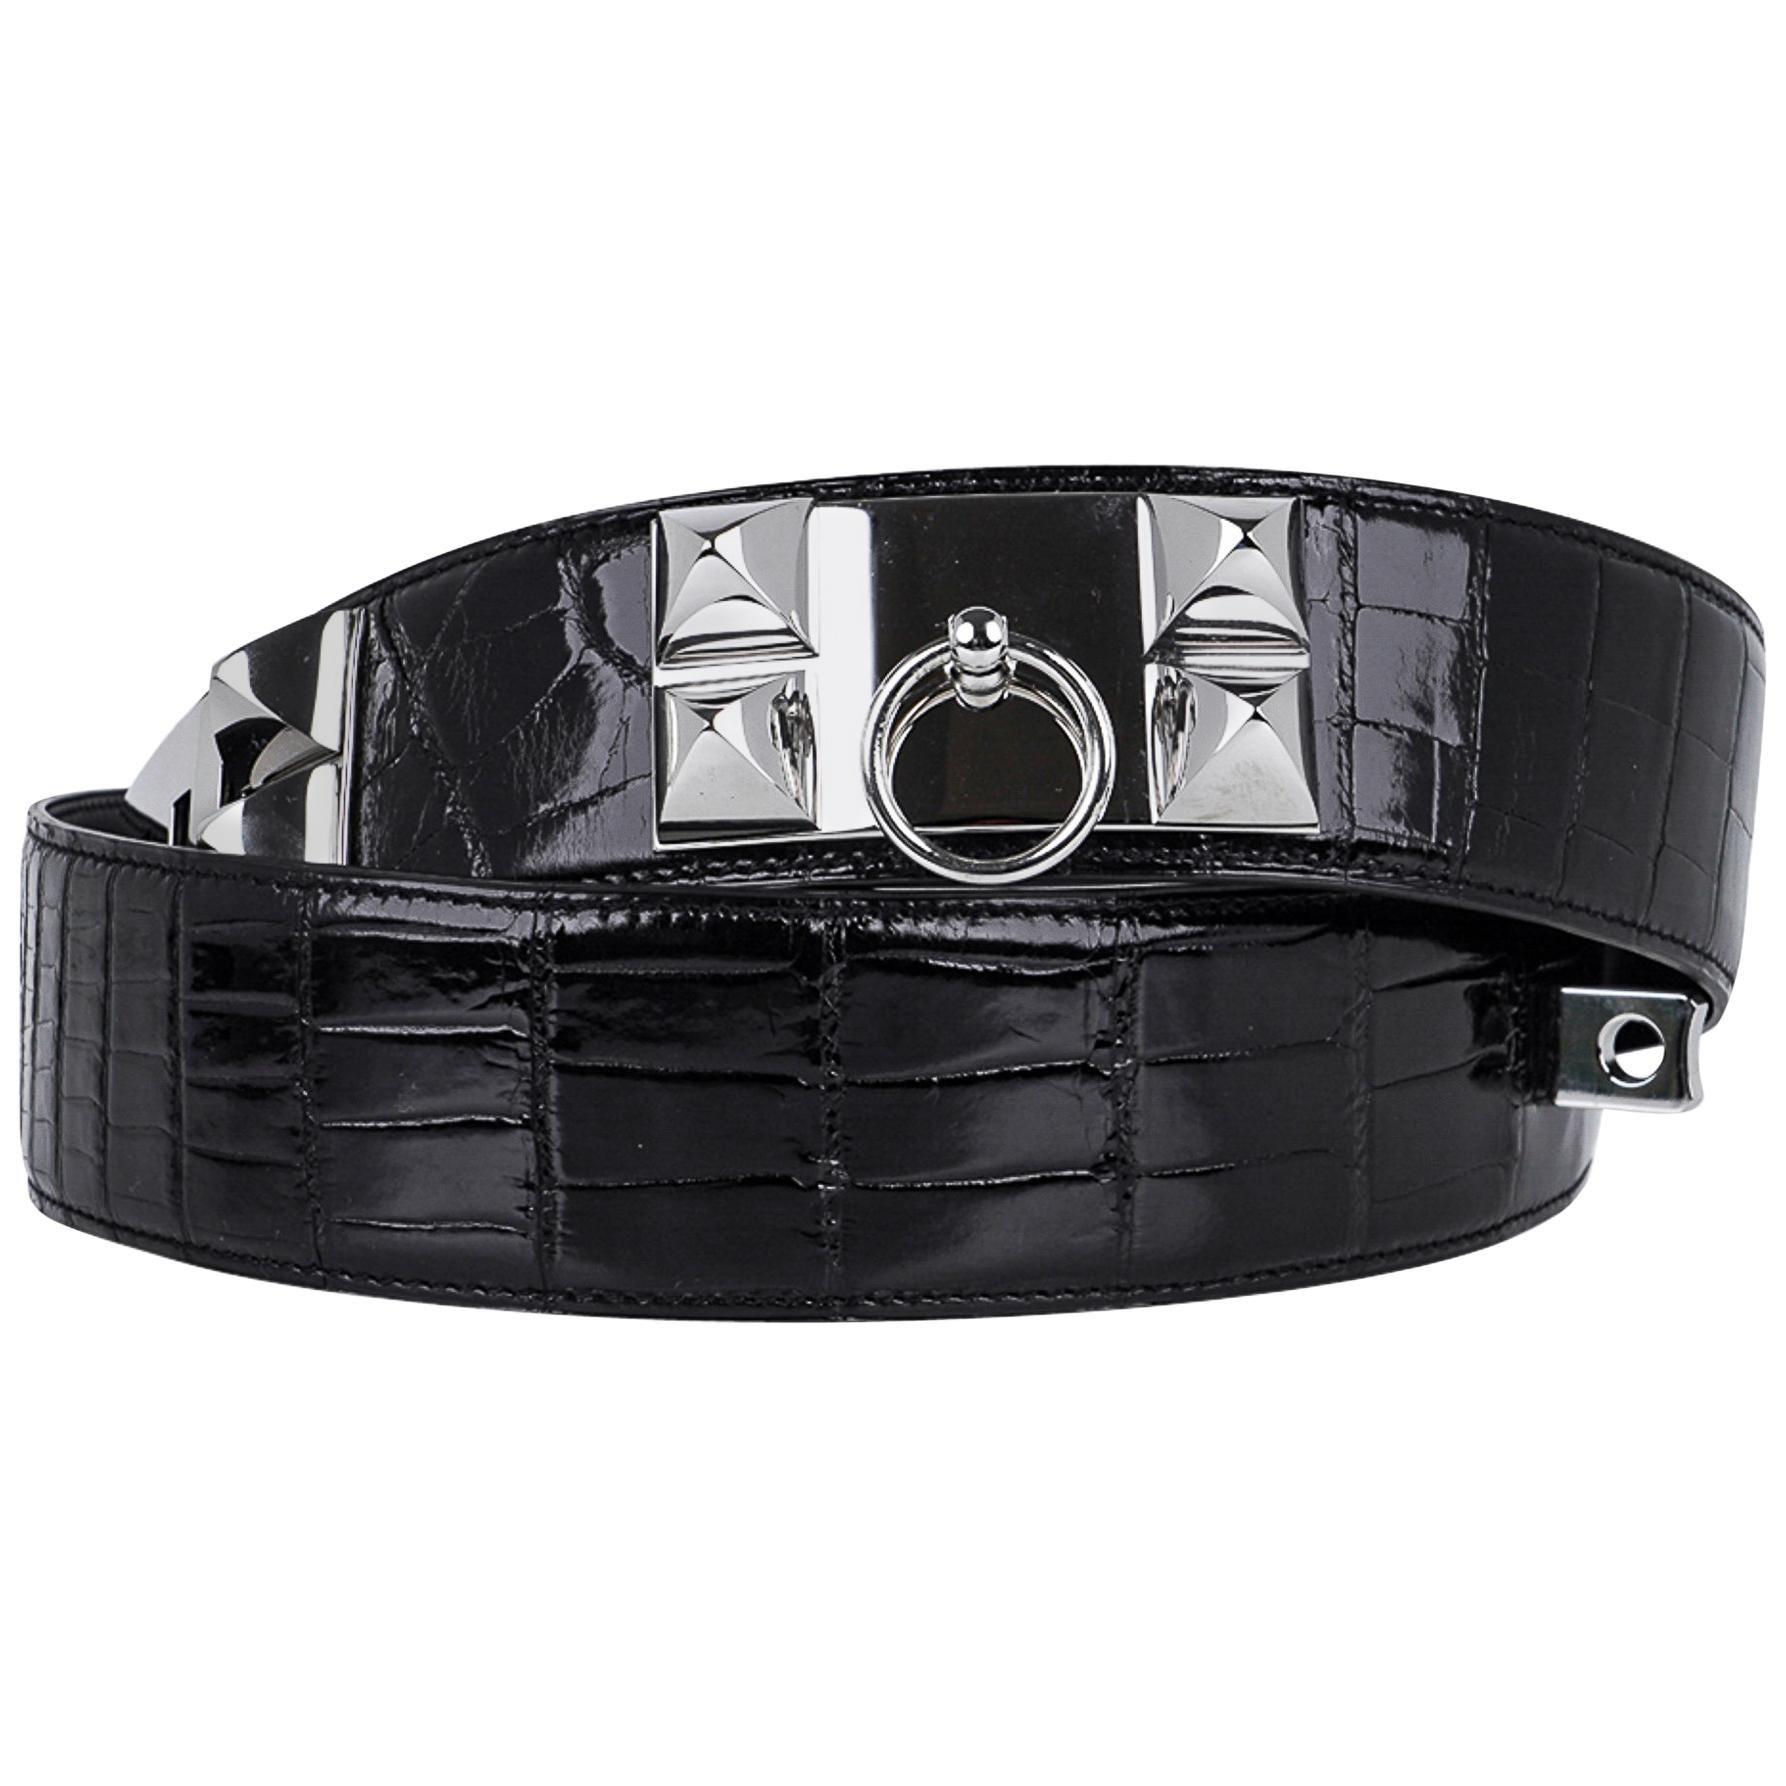 Hermes Collier De Chien Belt Black Porosus Crocodile Palladium 90 New